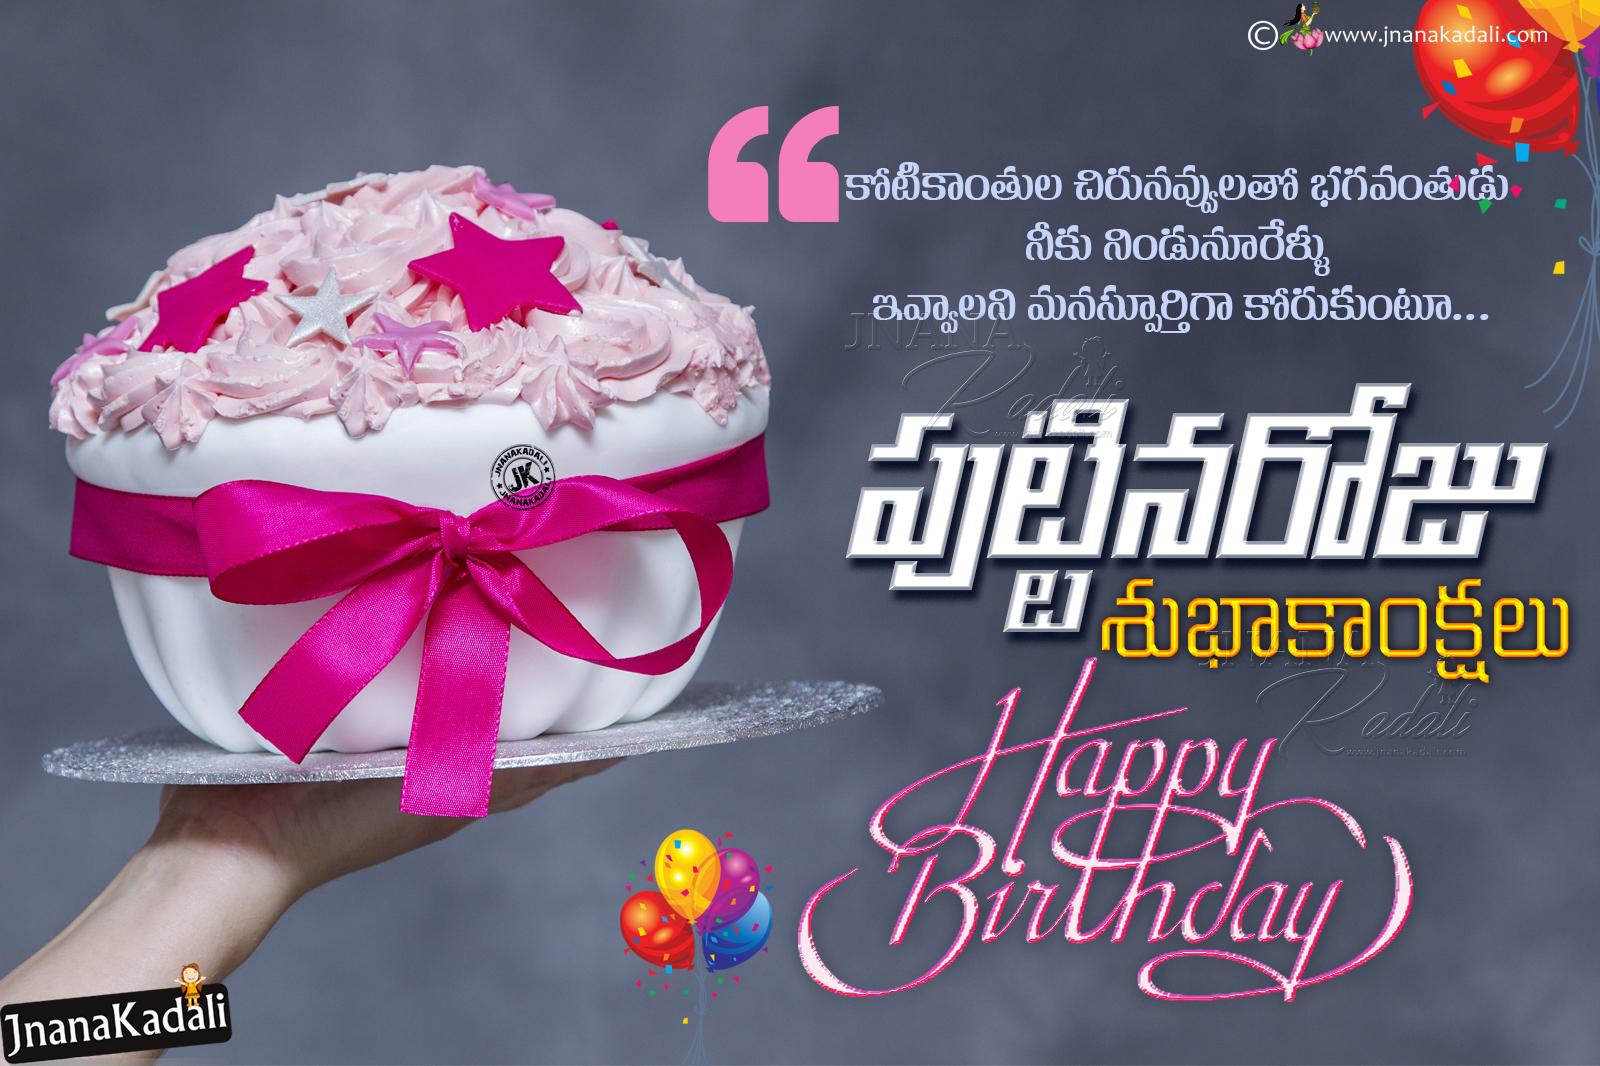 Birthday Wishes Audio free download